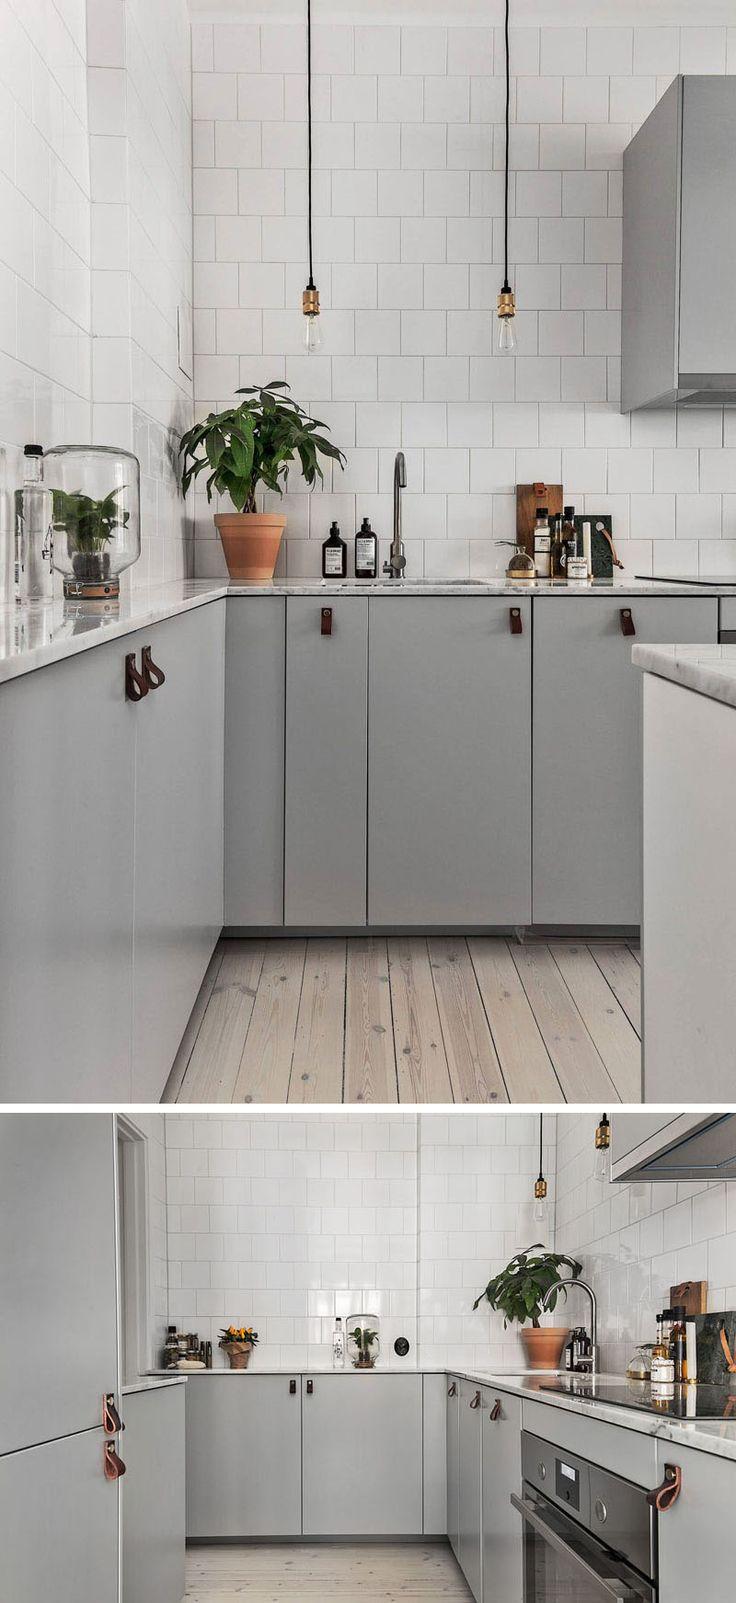 25 best ideas about nordic kitchen on pinterest nordic - Wandspiegel groay modern ...